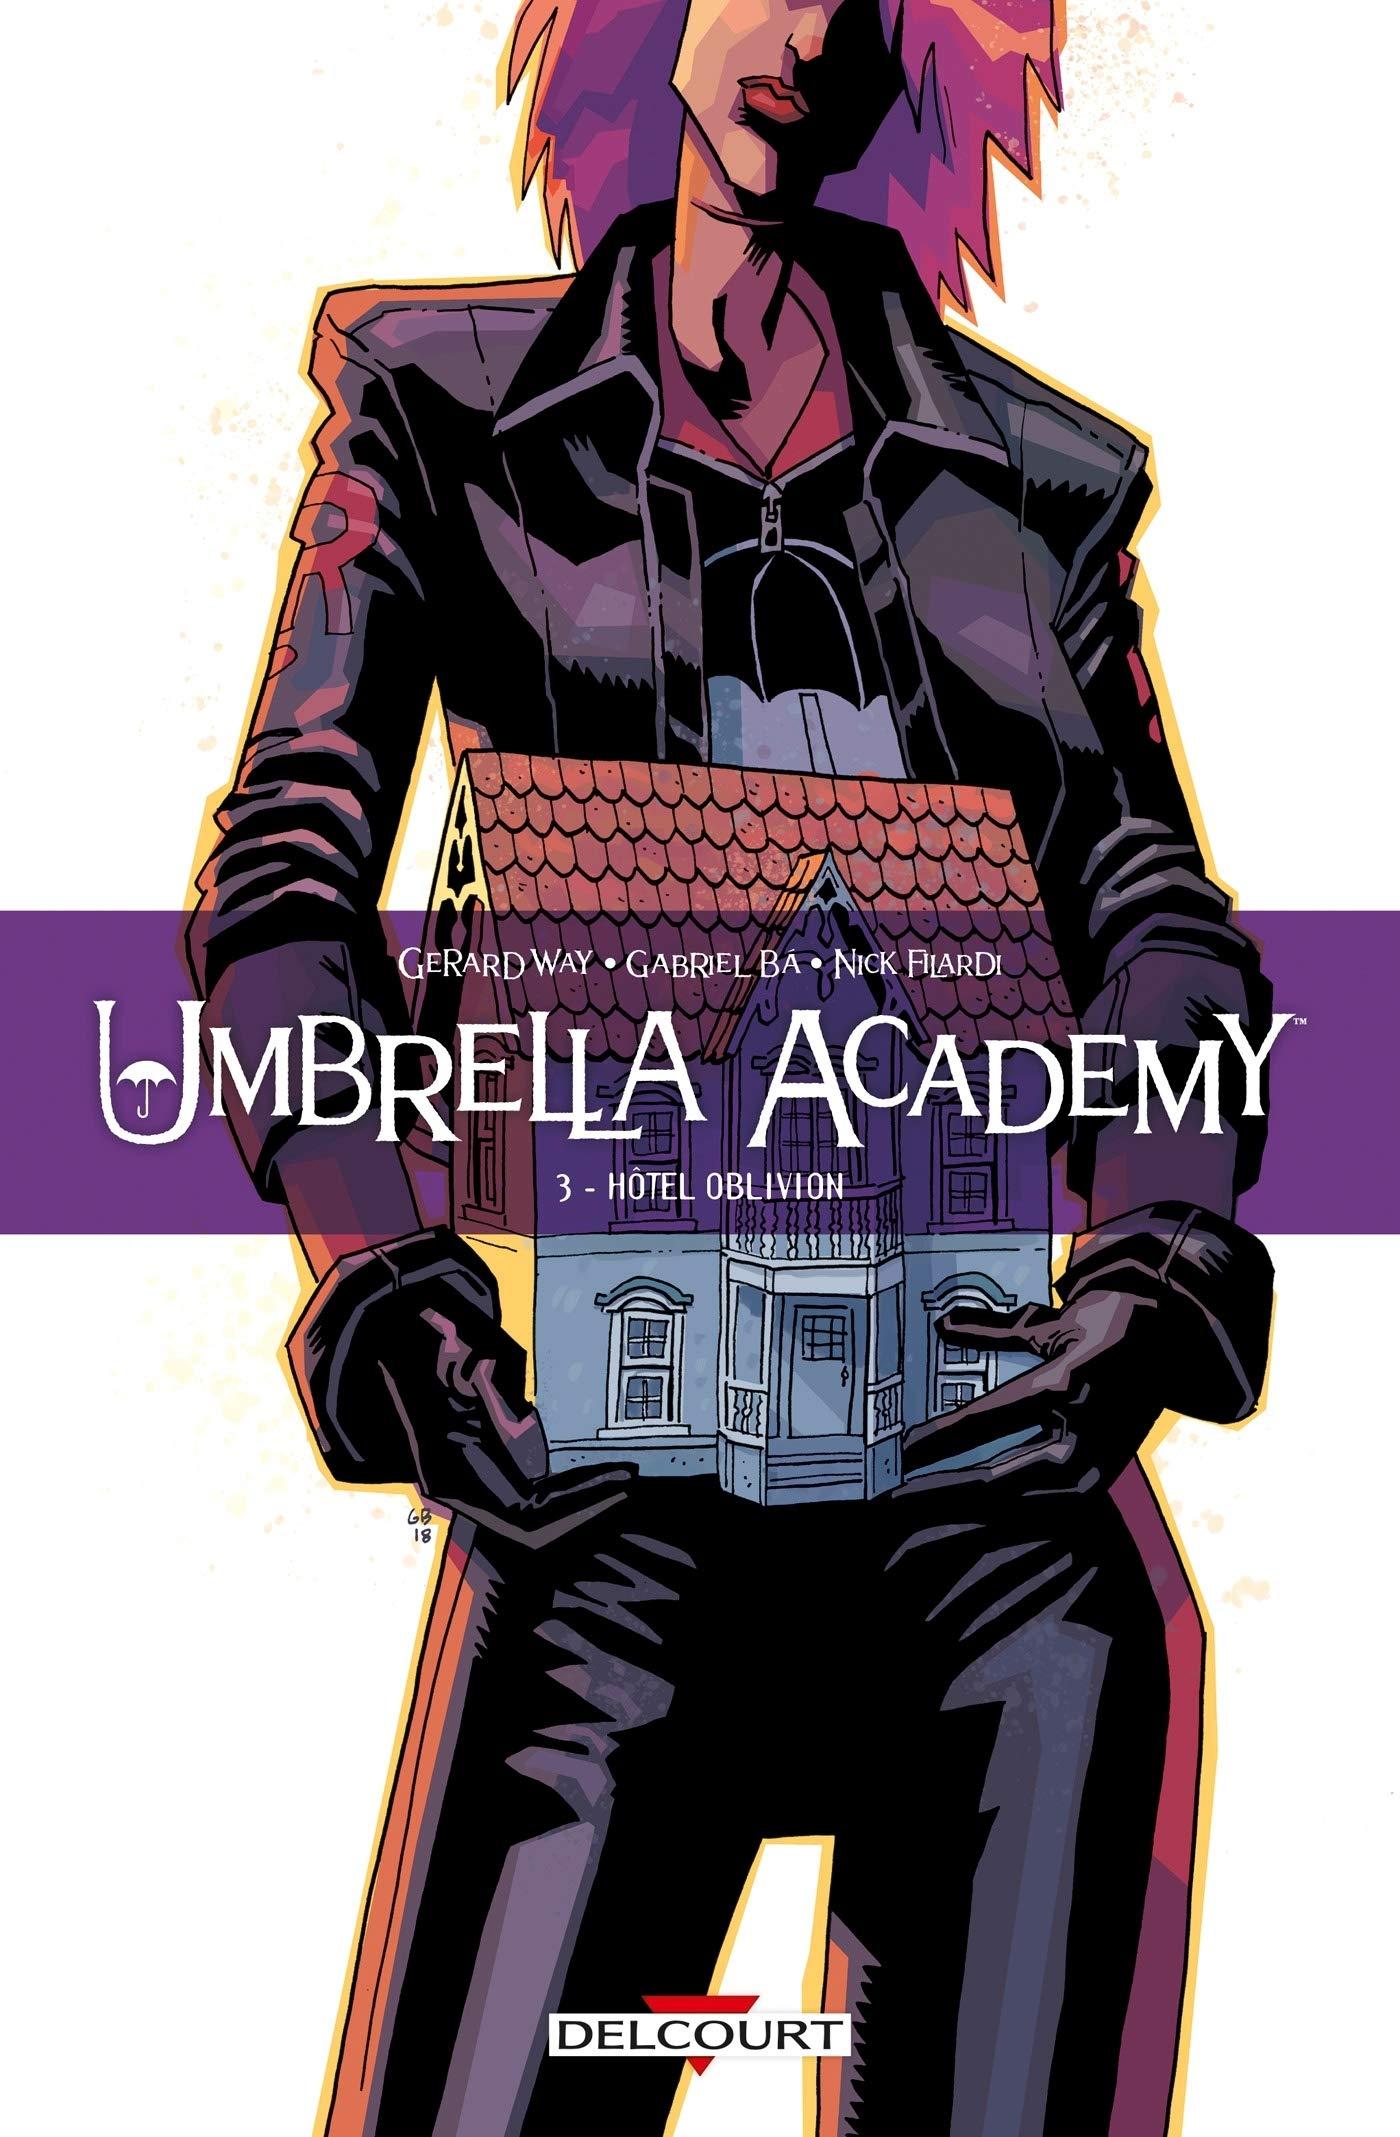 Umbrella Academy 3 - Hôtel Oblivion